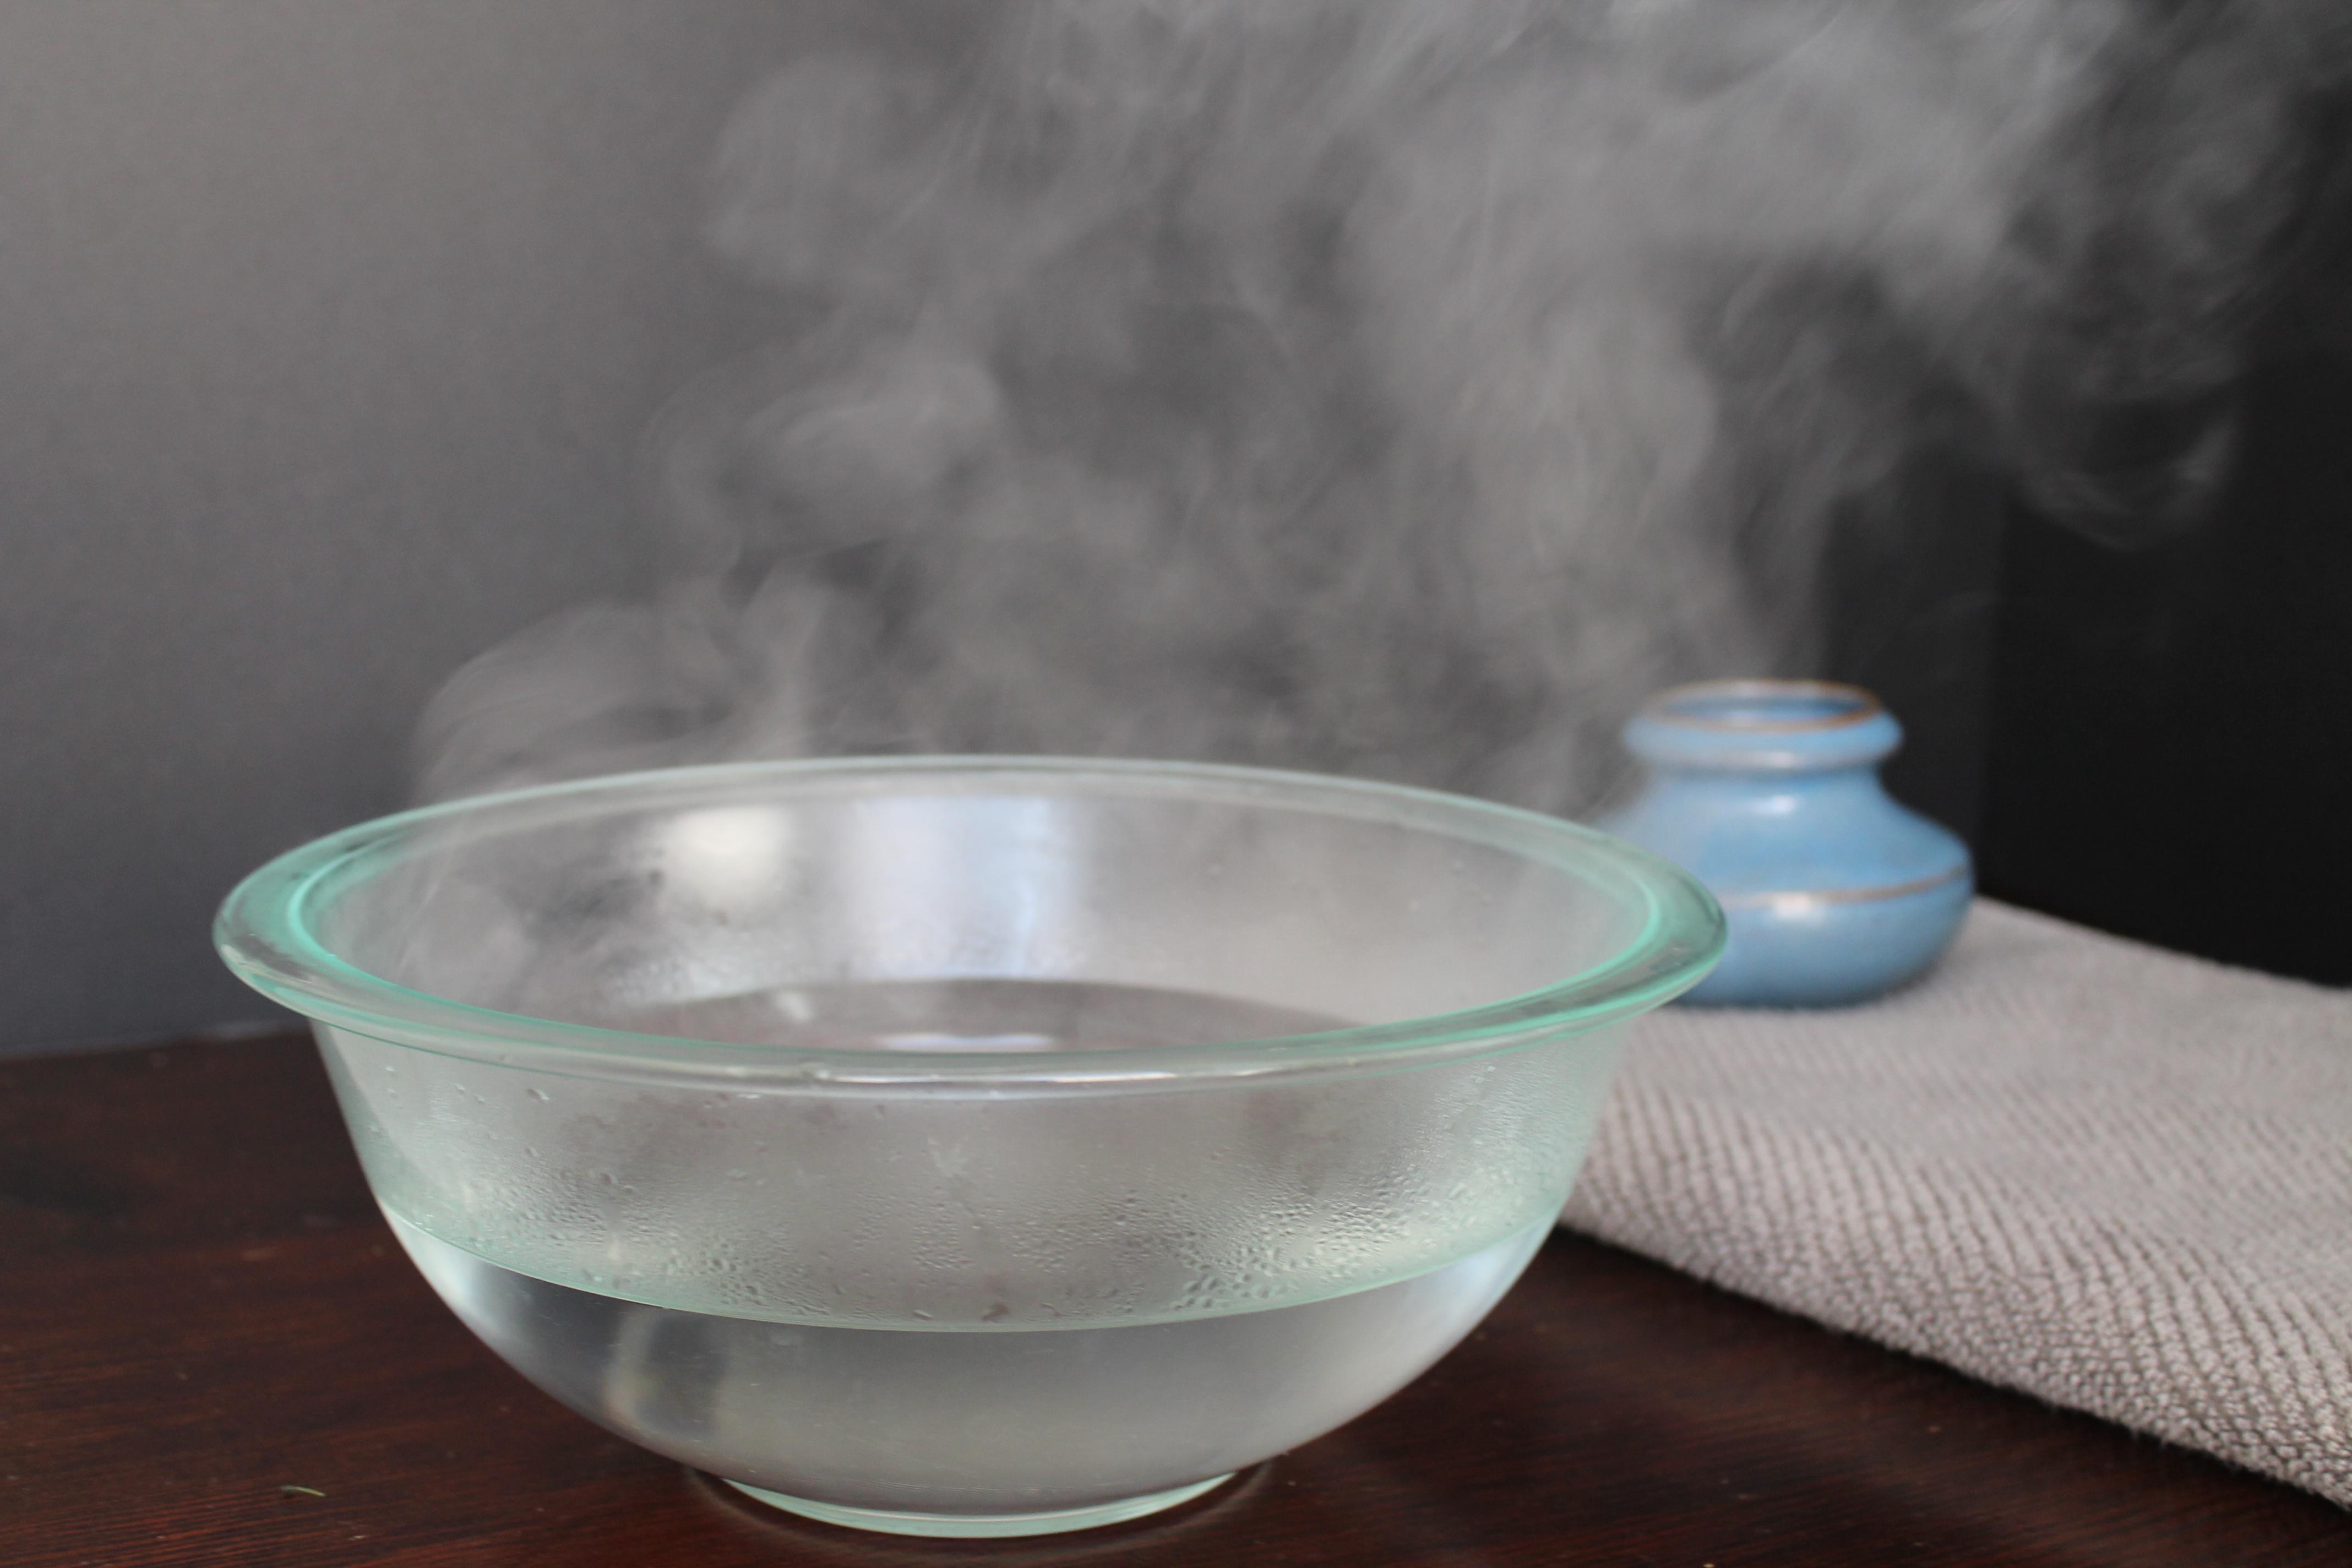 Decongesting Steam